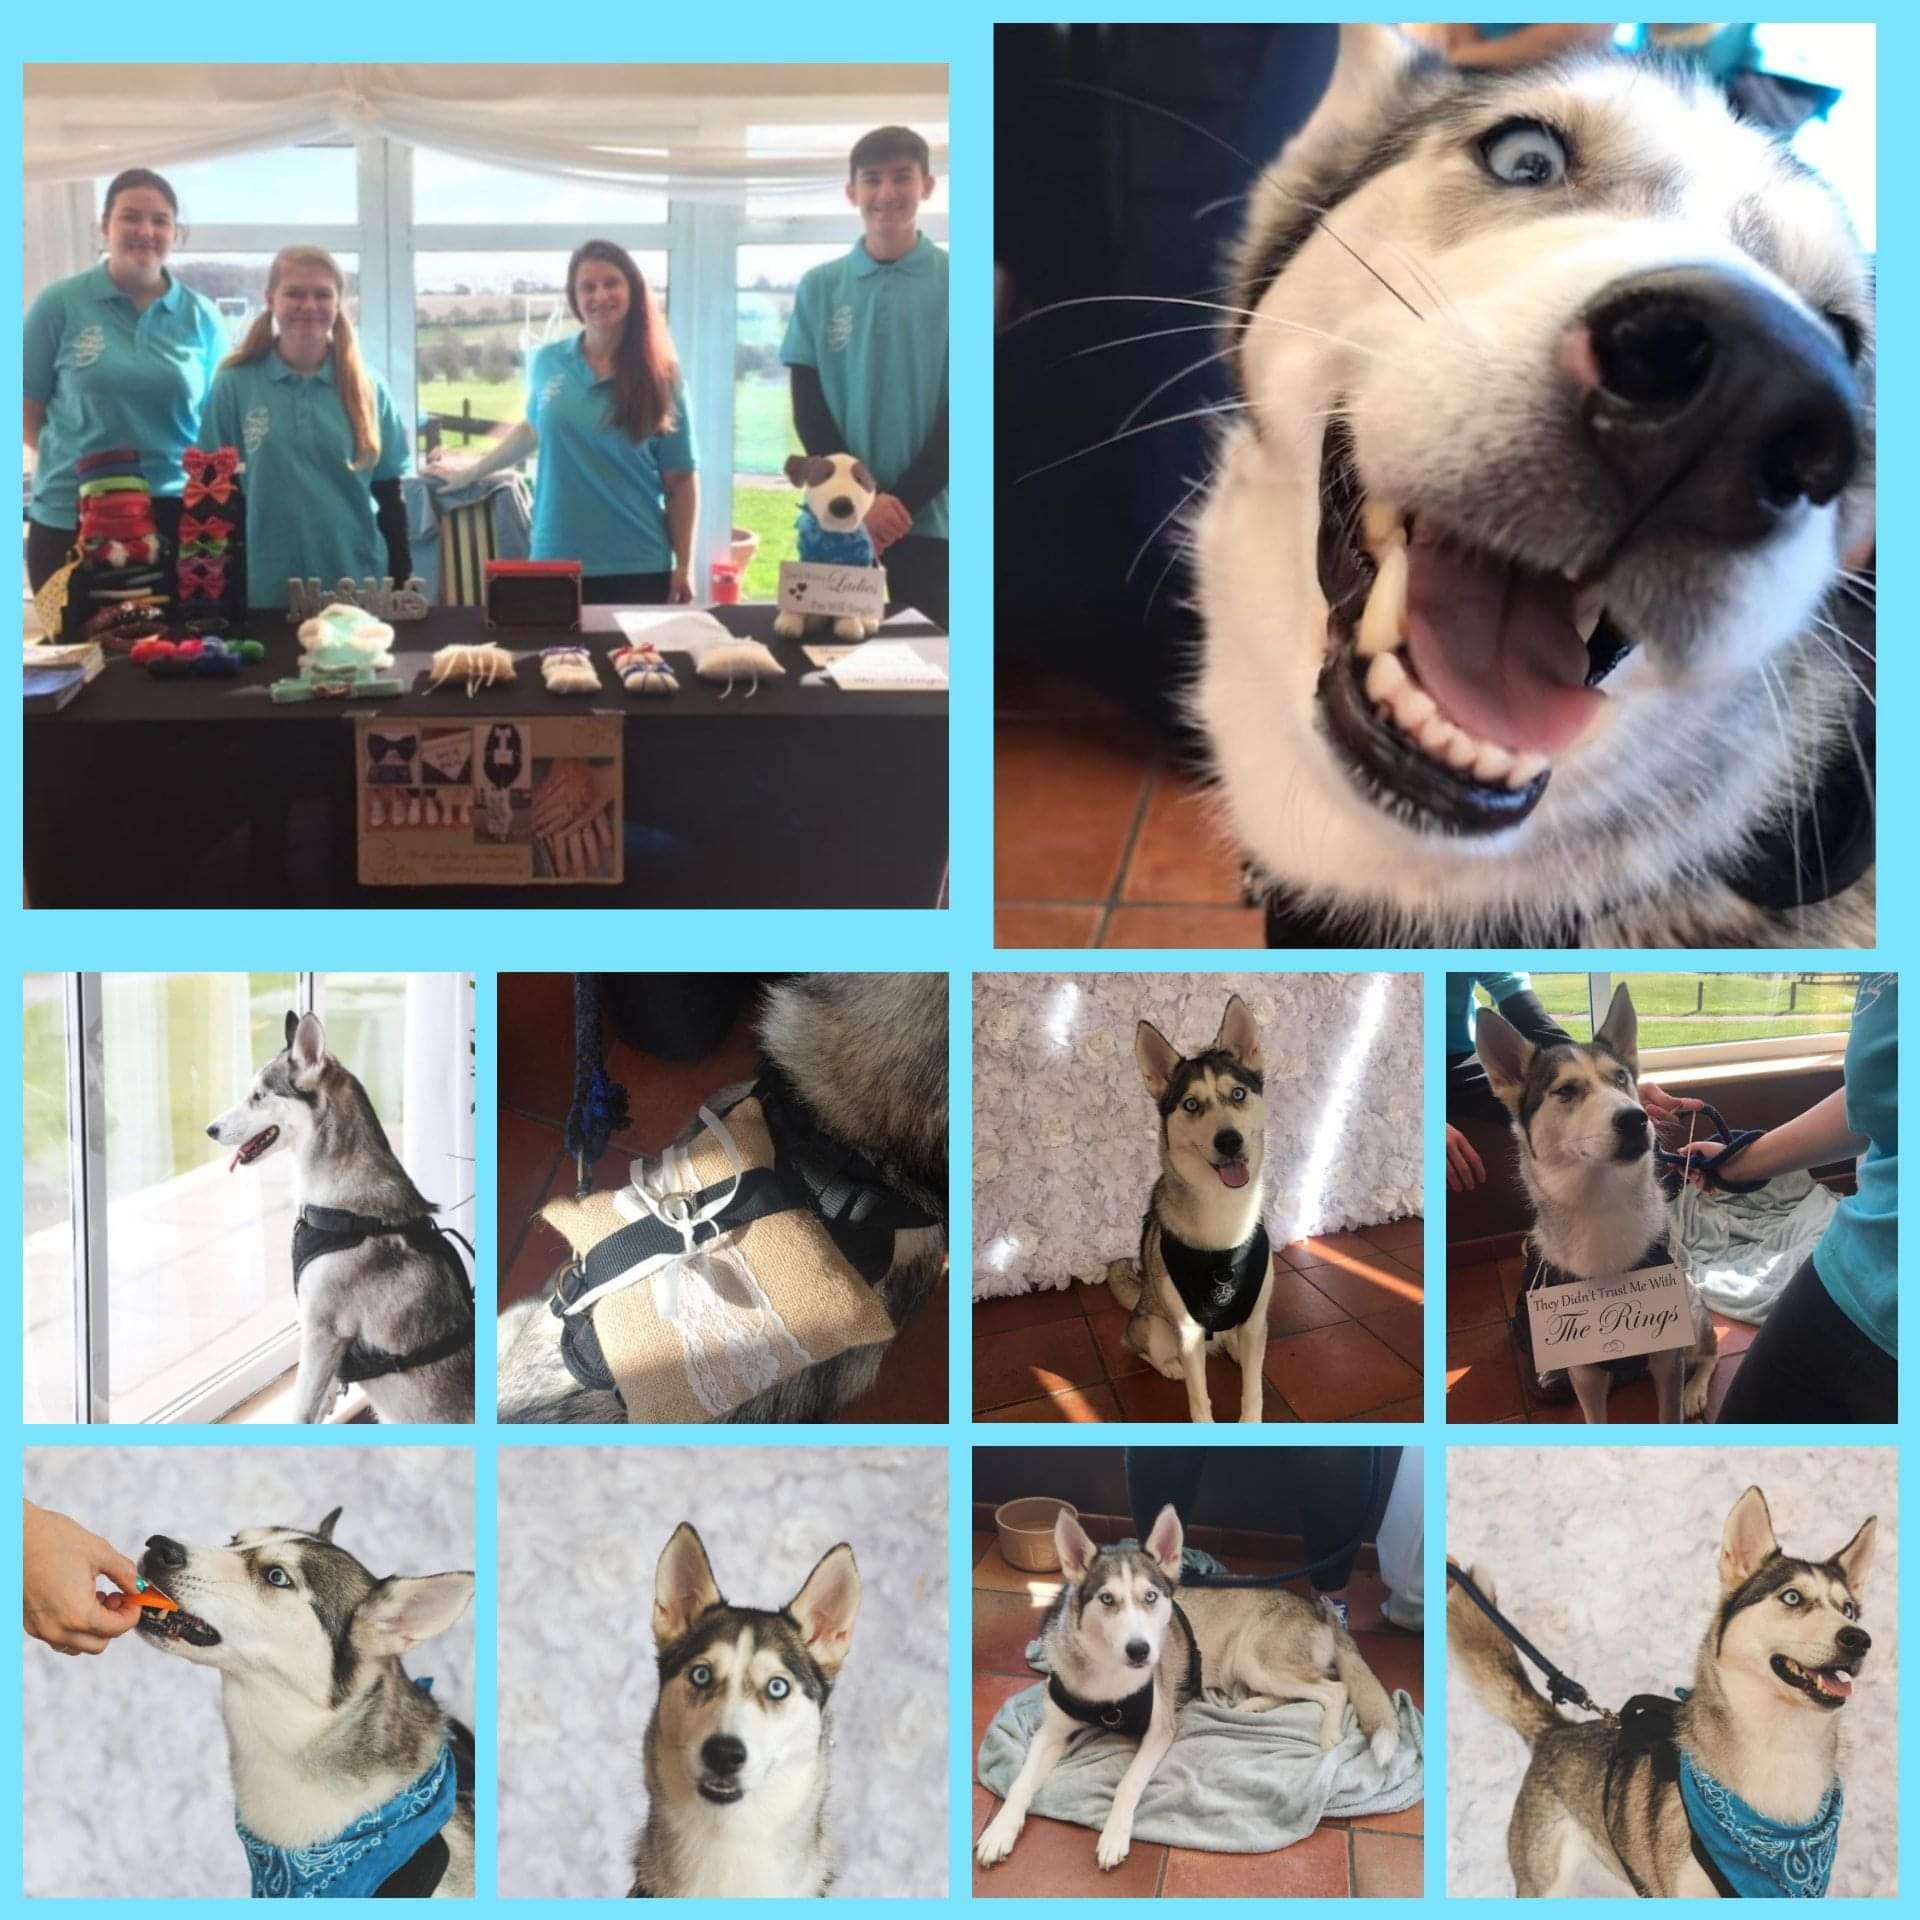 animal chaperone - wedding pet chaperone - pets at weddings - unconventional wedding - alternative wedding directory - wedding dog chaperone